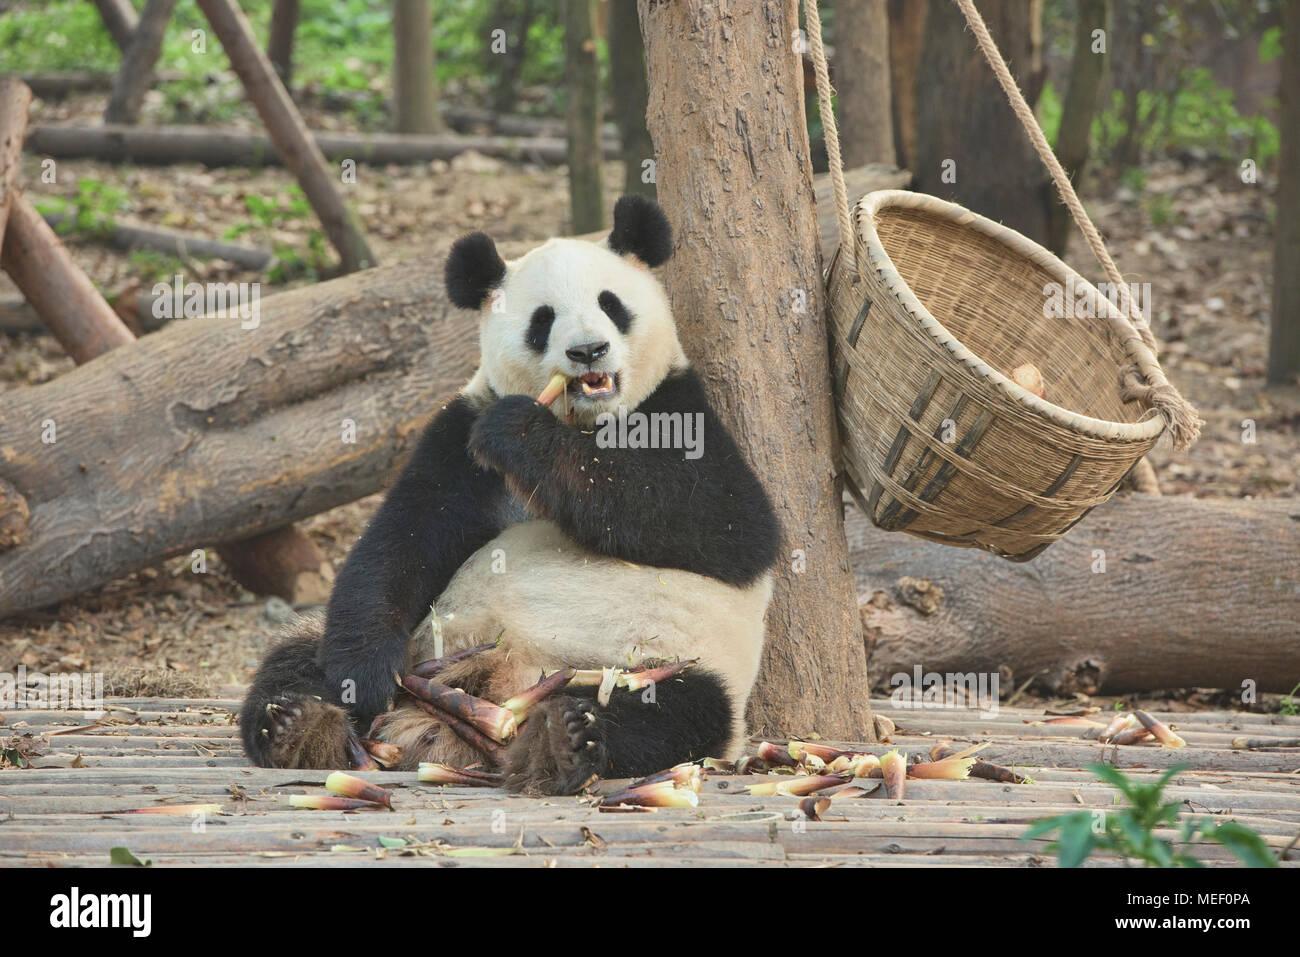 Panda Bambus An Der Chengdu Panda Forschungs Und Aufzuchtstation In